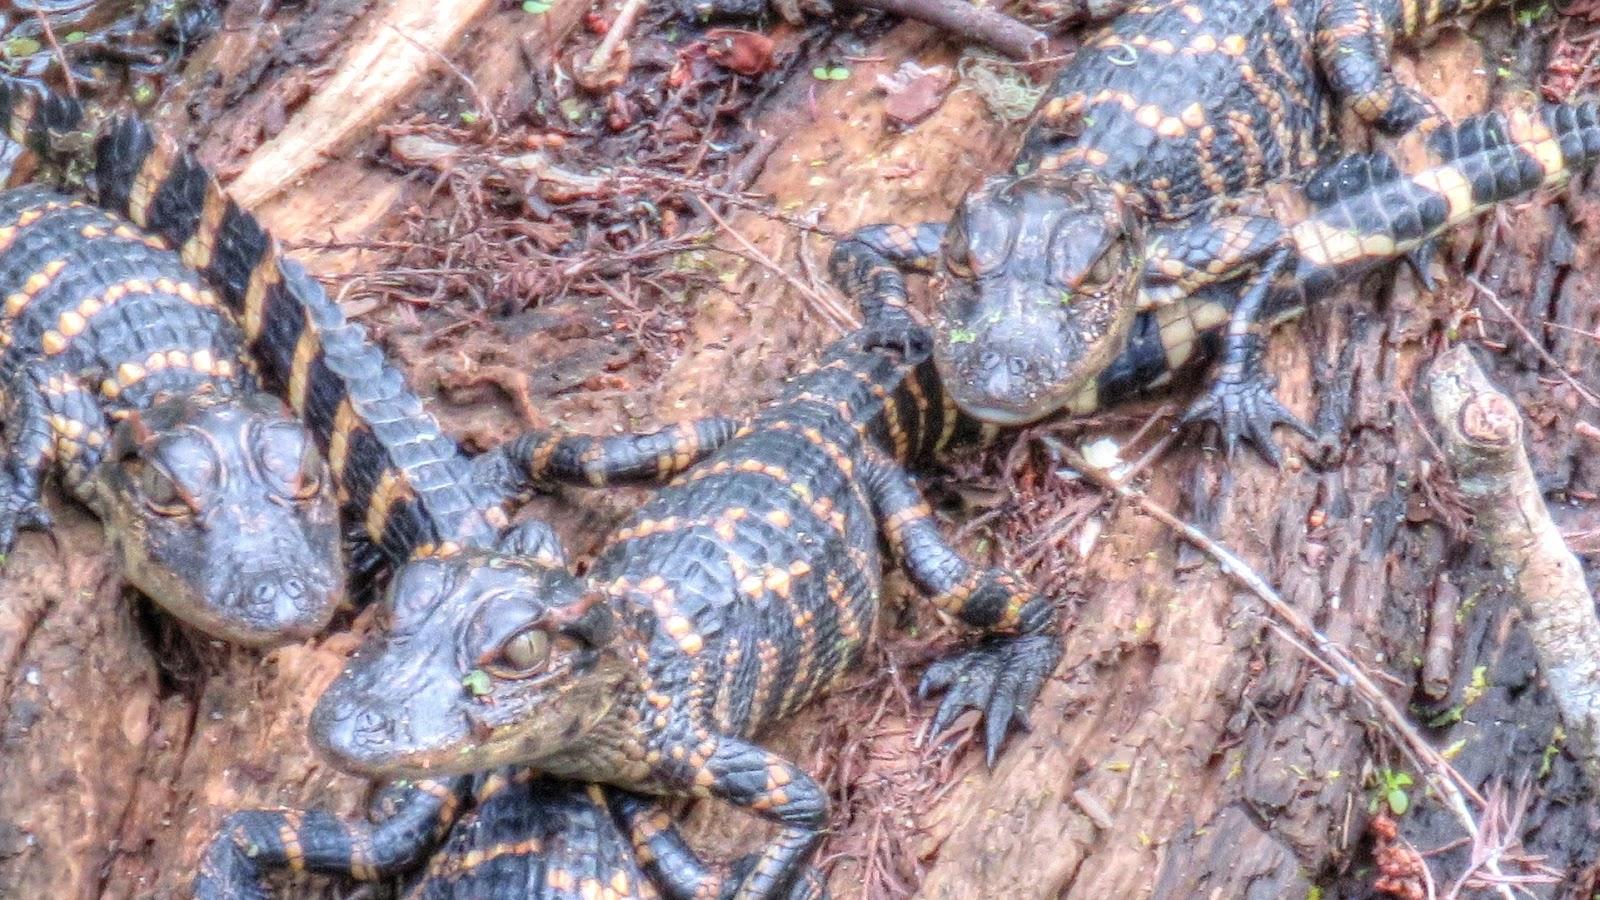 Backyard Birding And Nature Cute Baby Alligators